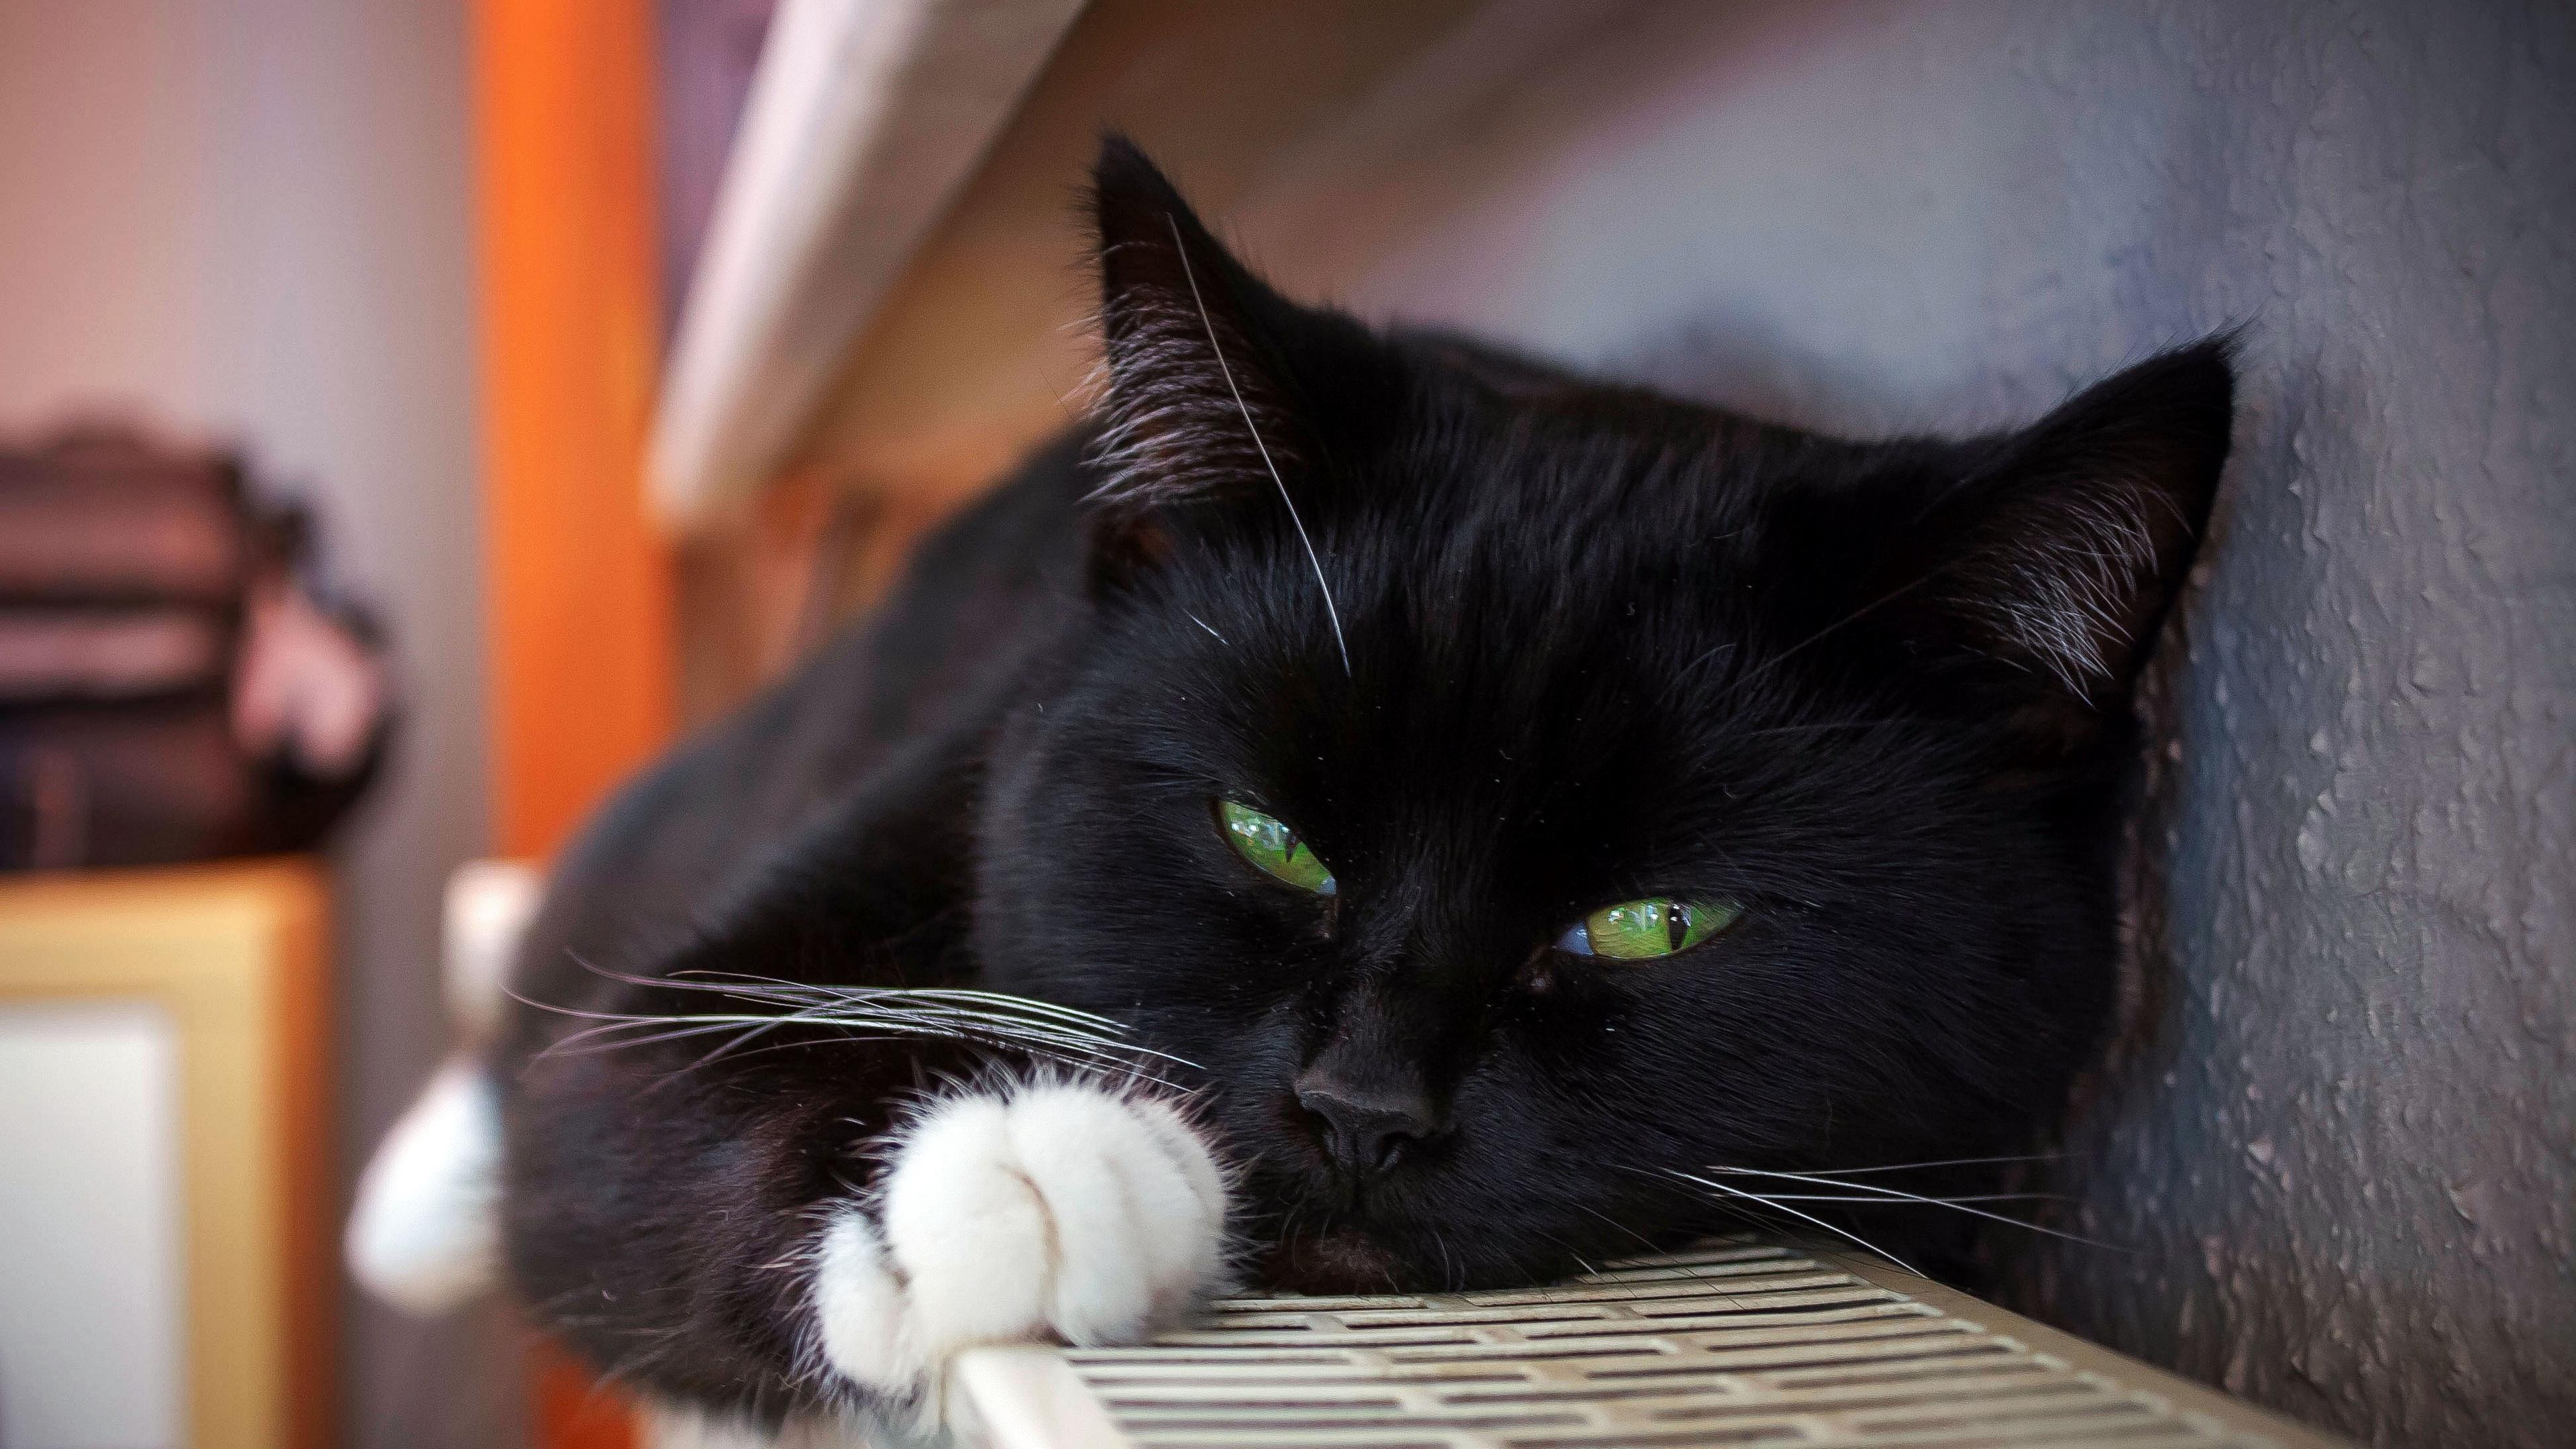 cat black lying spotted whiskers 4k 1542242744 - cat, black, lying, spotted, whiskers 4k - Lying, Cat, Black